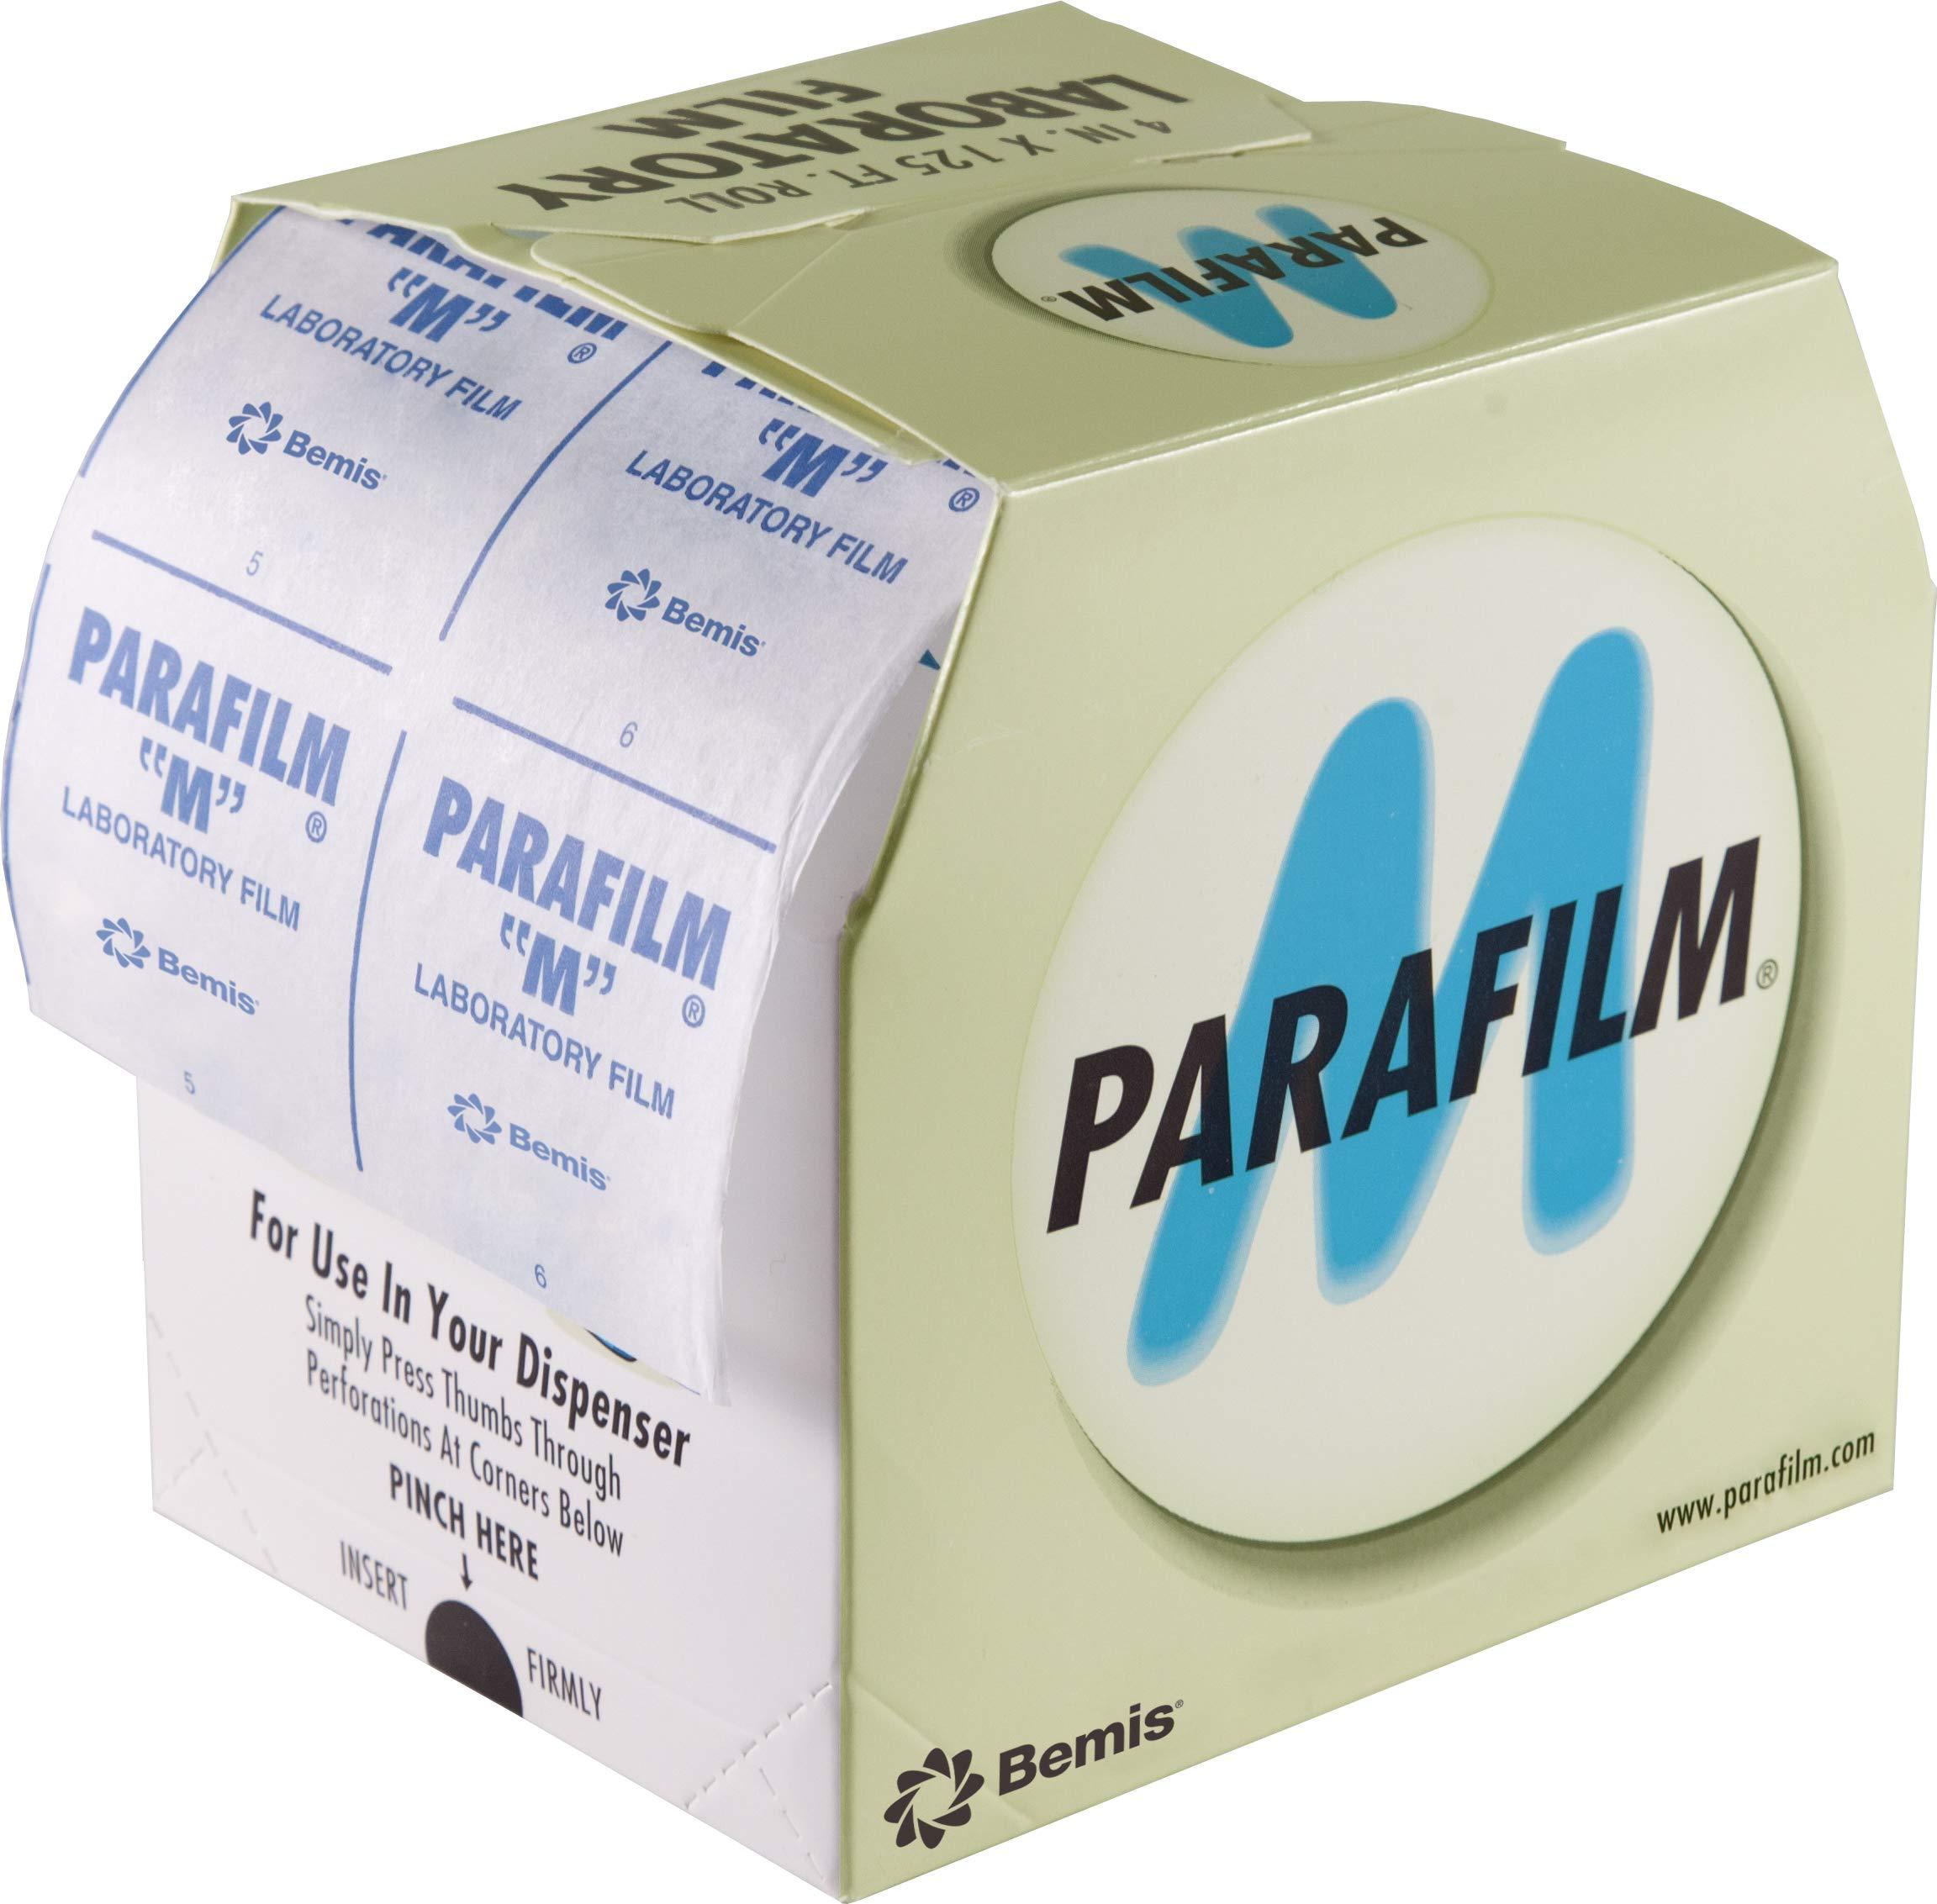 Heathrow Scientific HD234526B Parafilm Moisture Proof Sealing Film, 132mm Width x 135mm Height x 112mm Depth by Heathrow Scientific